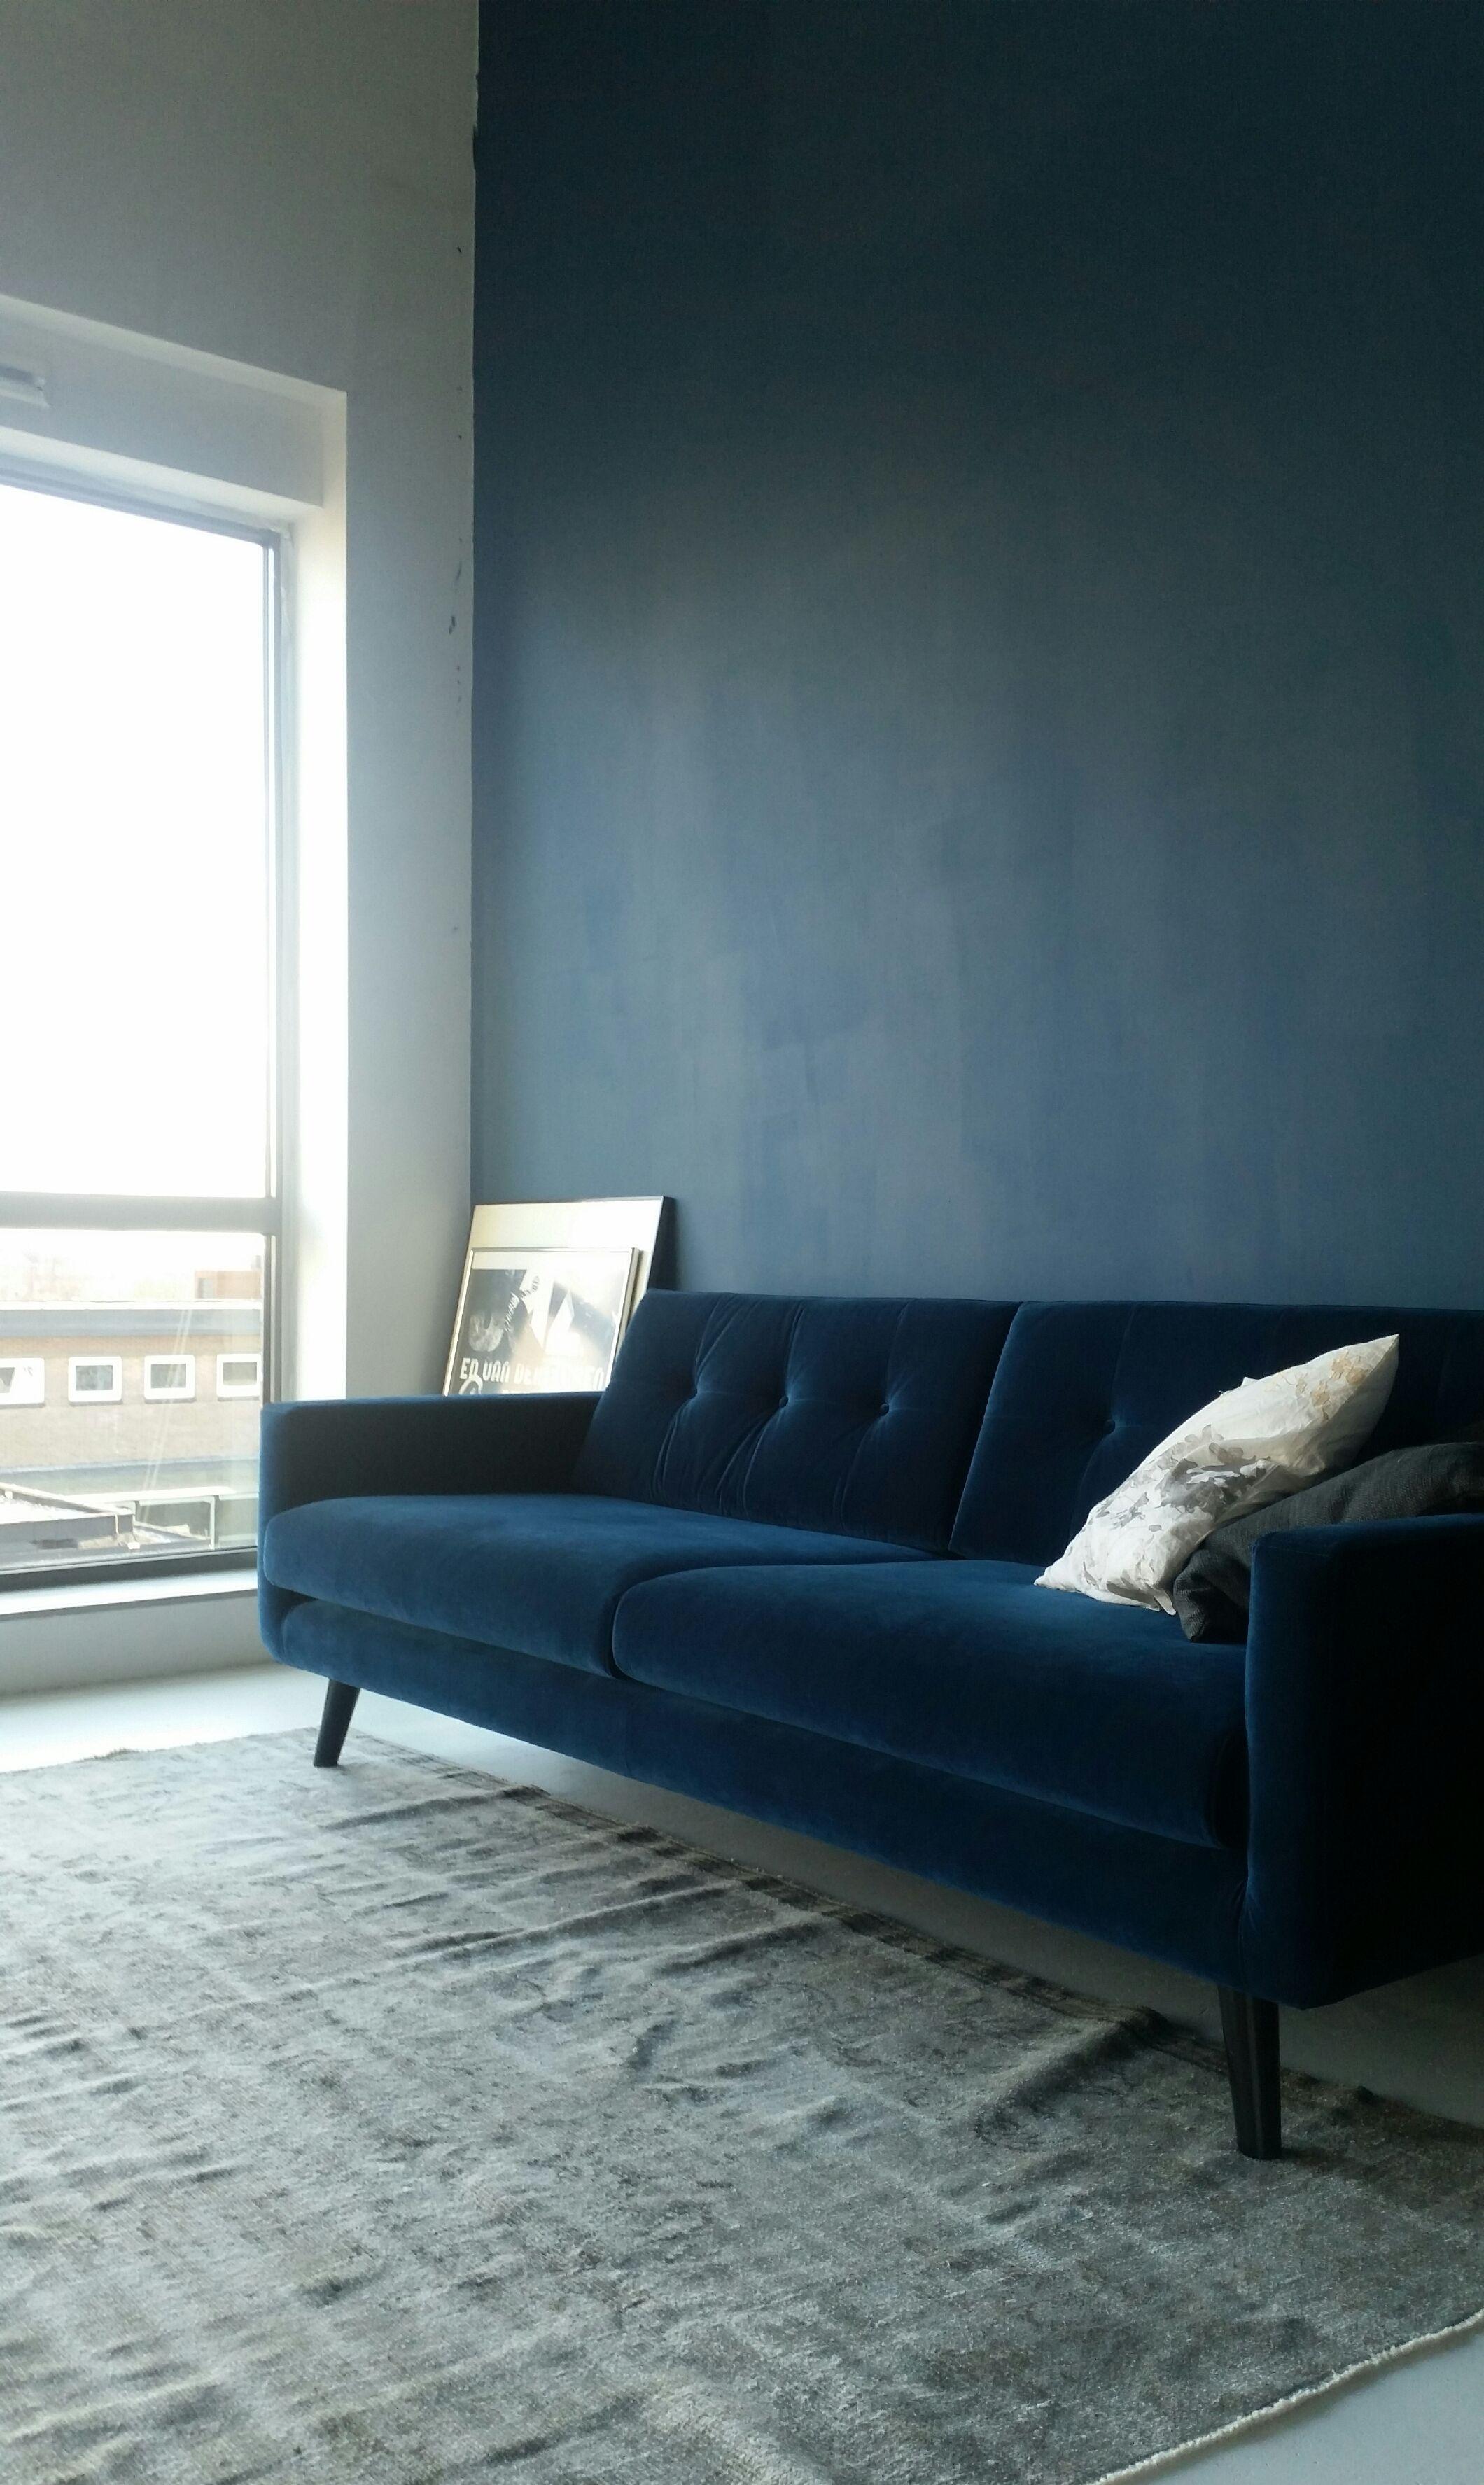 Blickfang Sofa Company Foto Von #panynl - Www.panyreview | Conrad, 3-seater, Velour